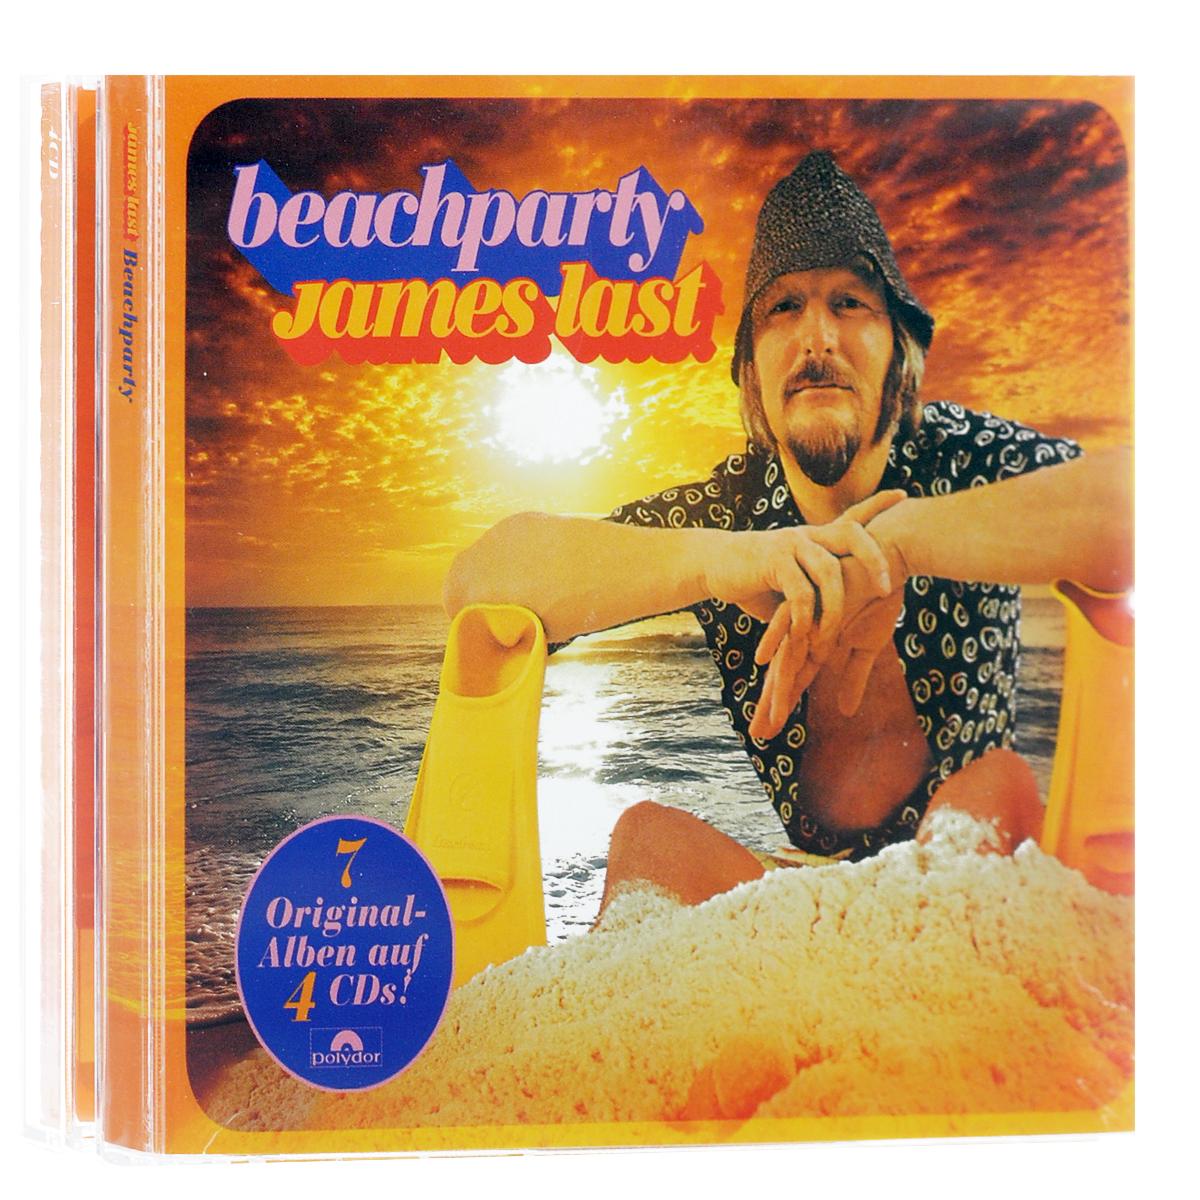 Джеймс Ласт James Last. Beachparty (4 CD) джеймс ласт james last 80 greatest hits 3 cd